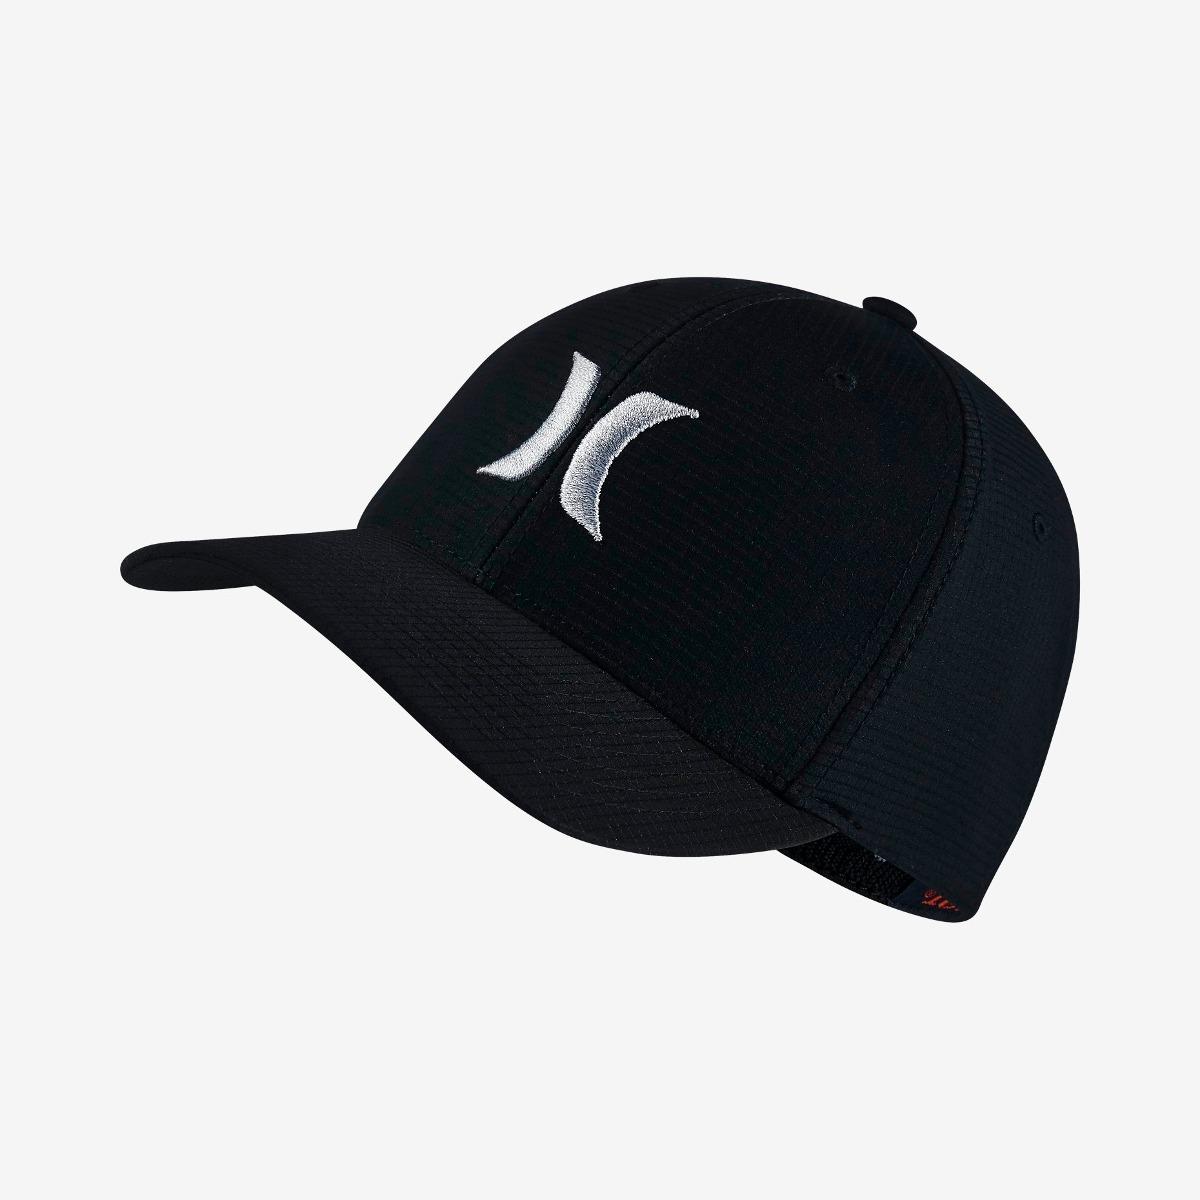 Gorra Hurley Flexfit Black Suits -   619.99 en Mercado Libre 1148c3dfe1c